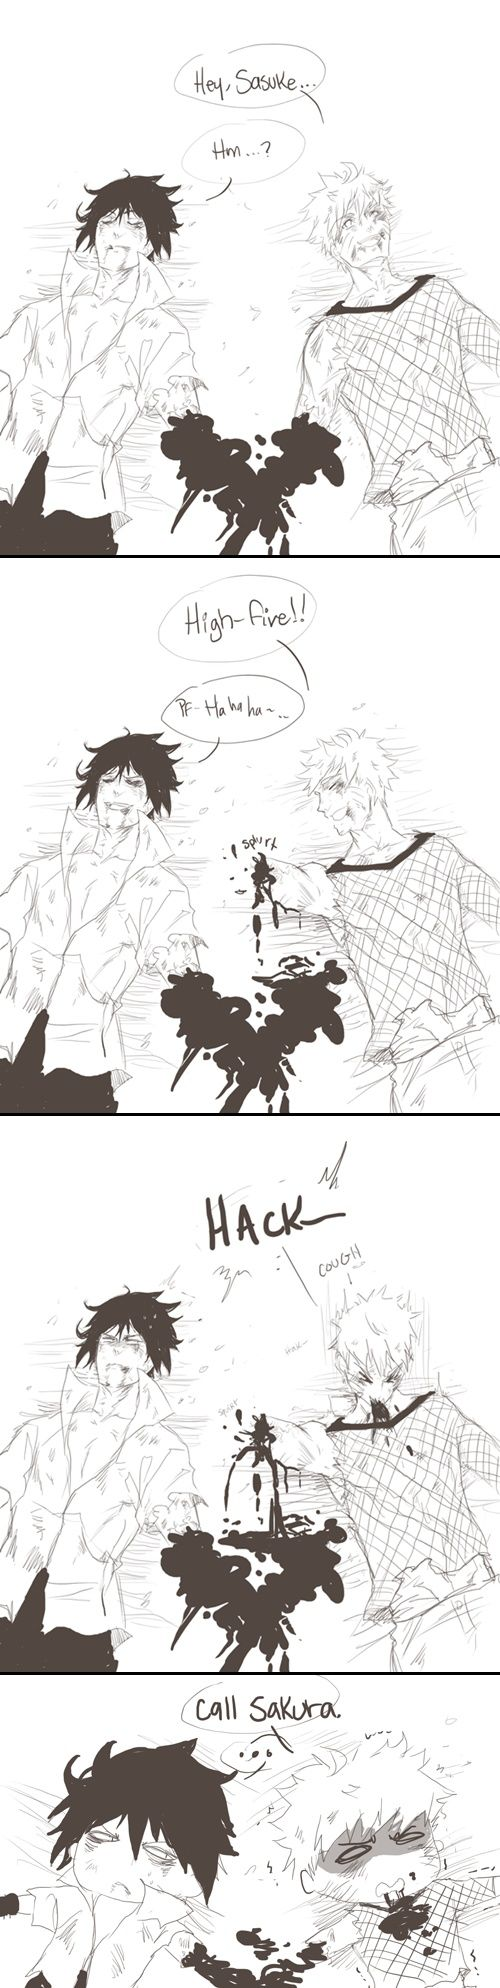 Naruto and Sasuke Haha in the beginning Sakura was useless, now look they're calling for help